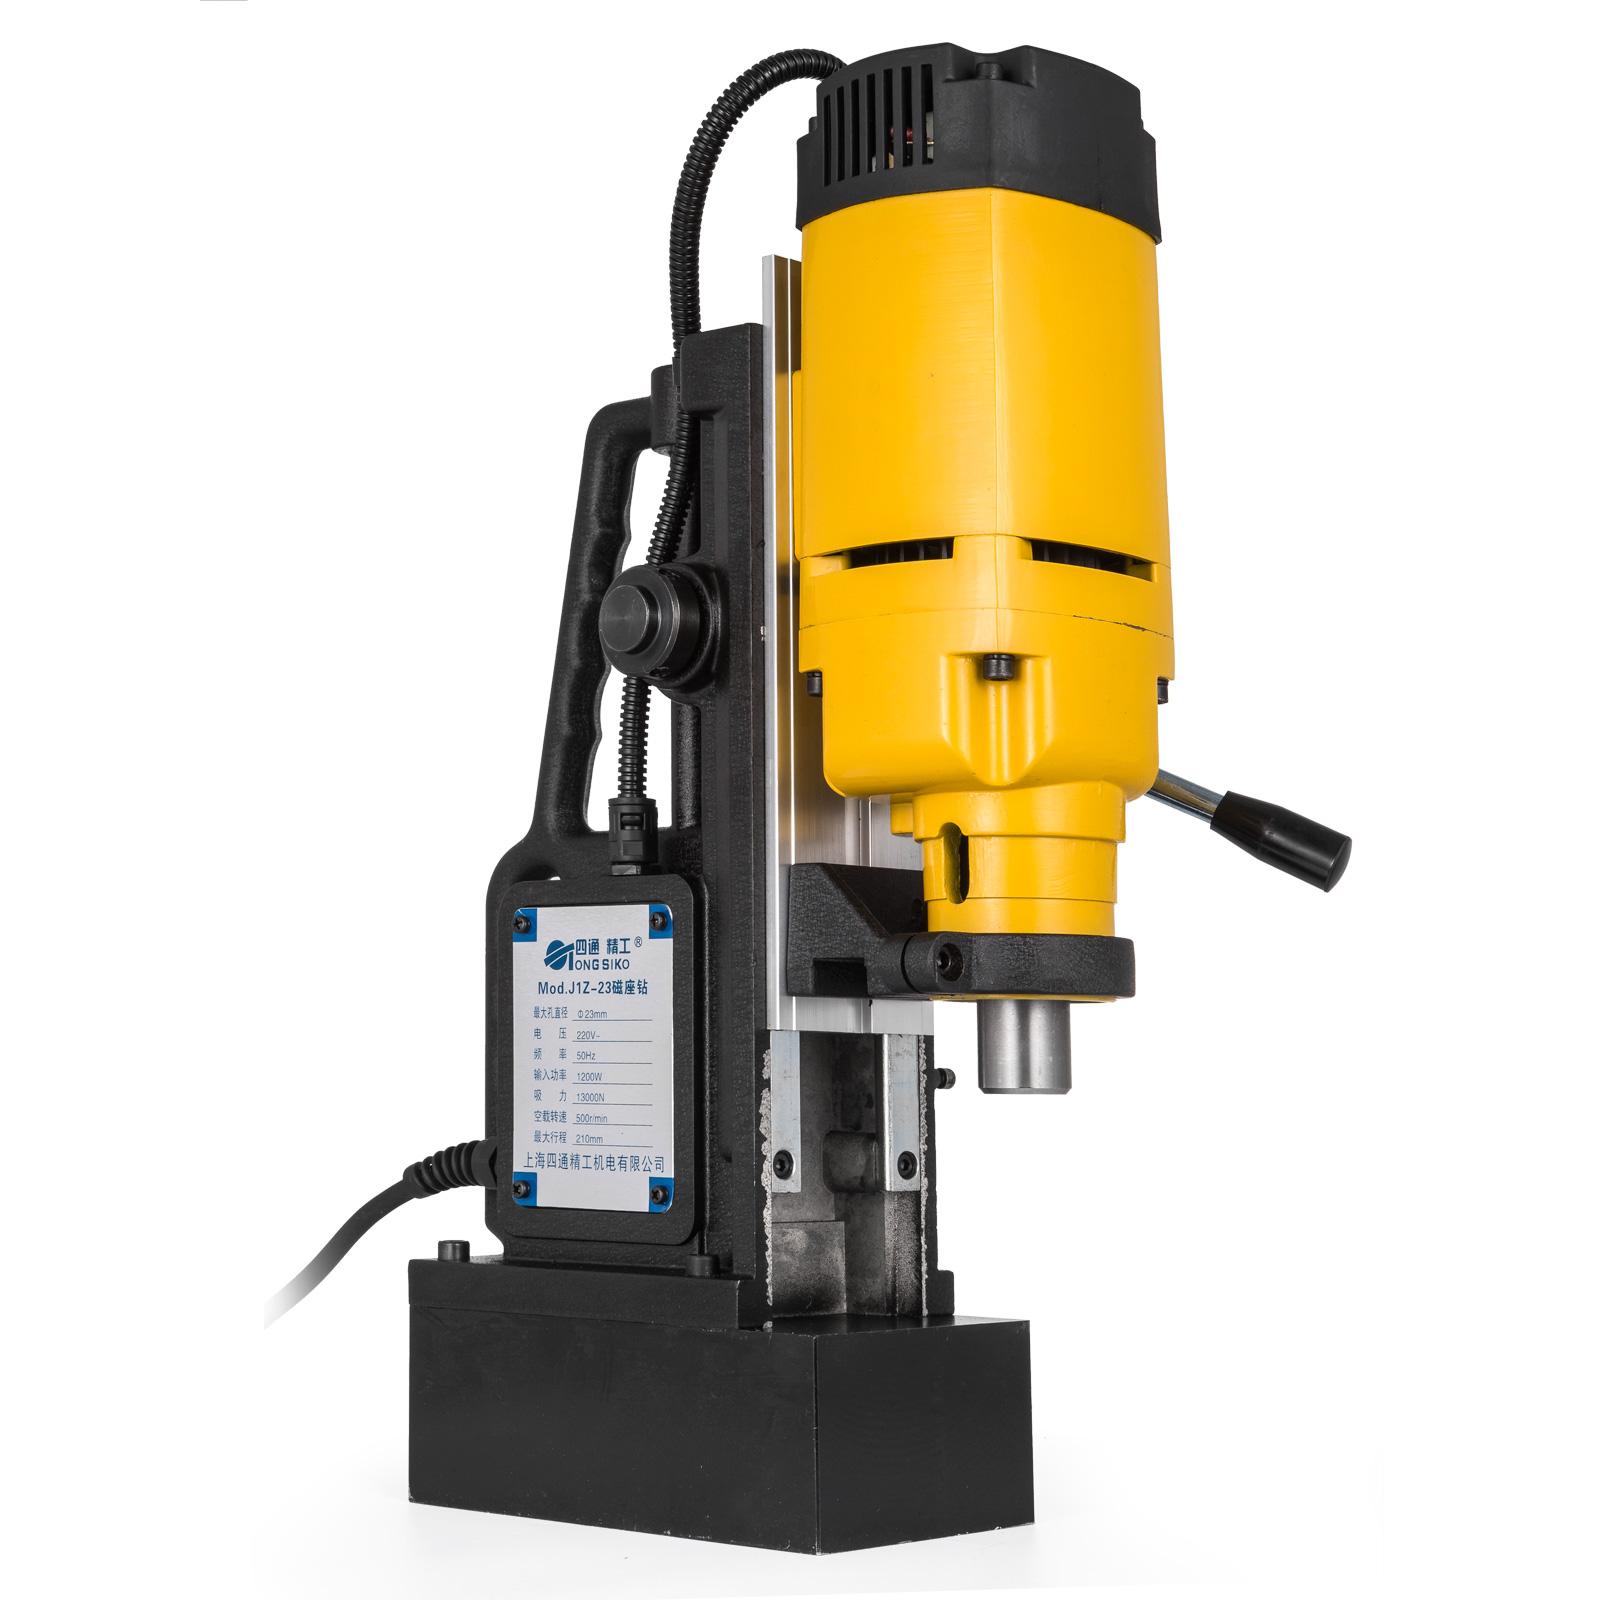 MB23-BRM35-MD40-Trapano-Perforatrice-Carotatore-Fresa-Magnetico-12-40mm-230V miniatura 53